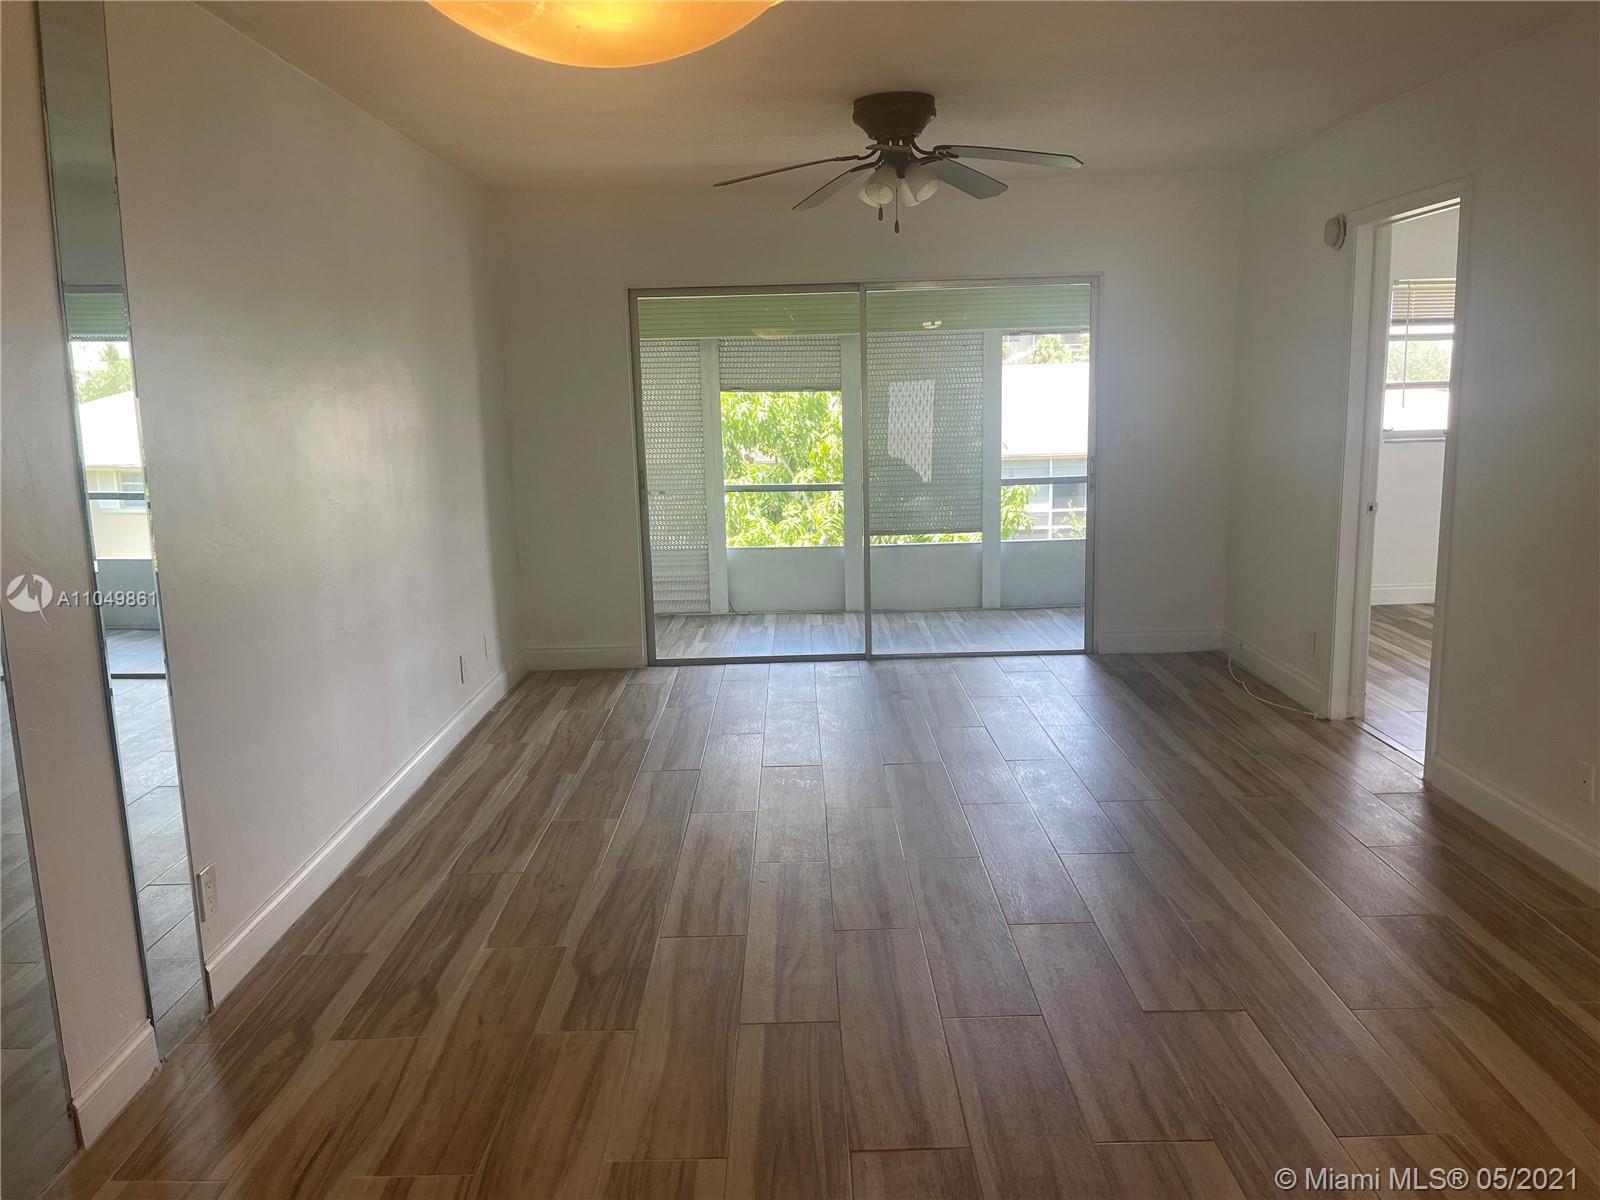 5800 Margate Blvd Unit 735-7, Margate, Florida 33063